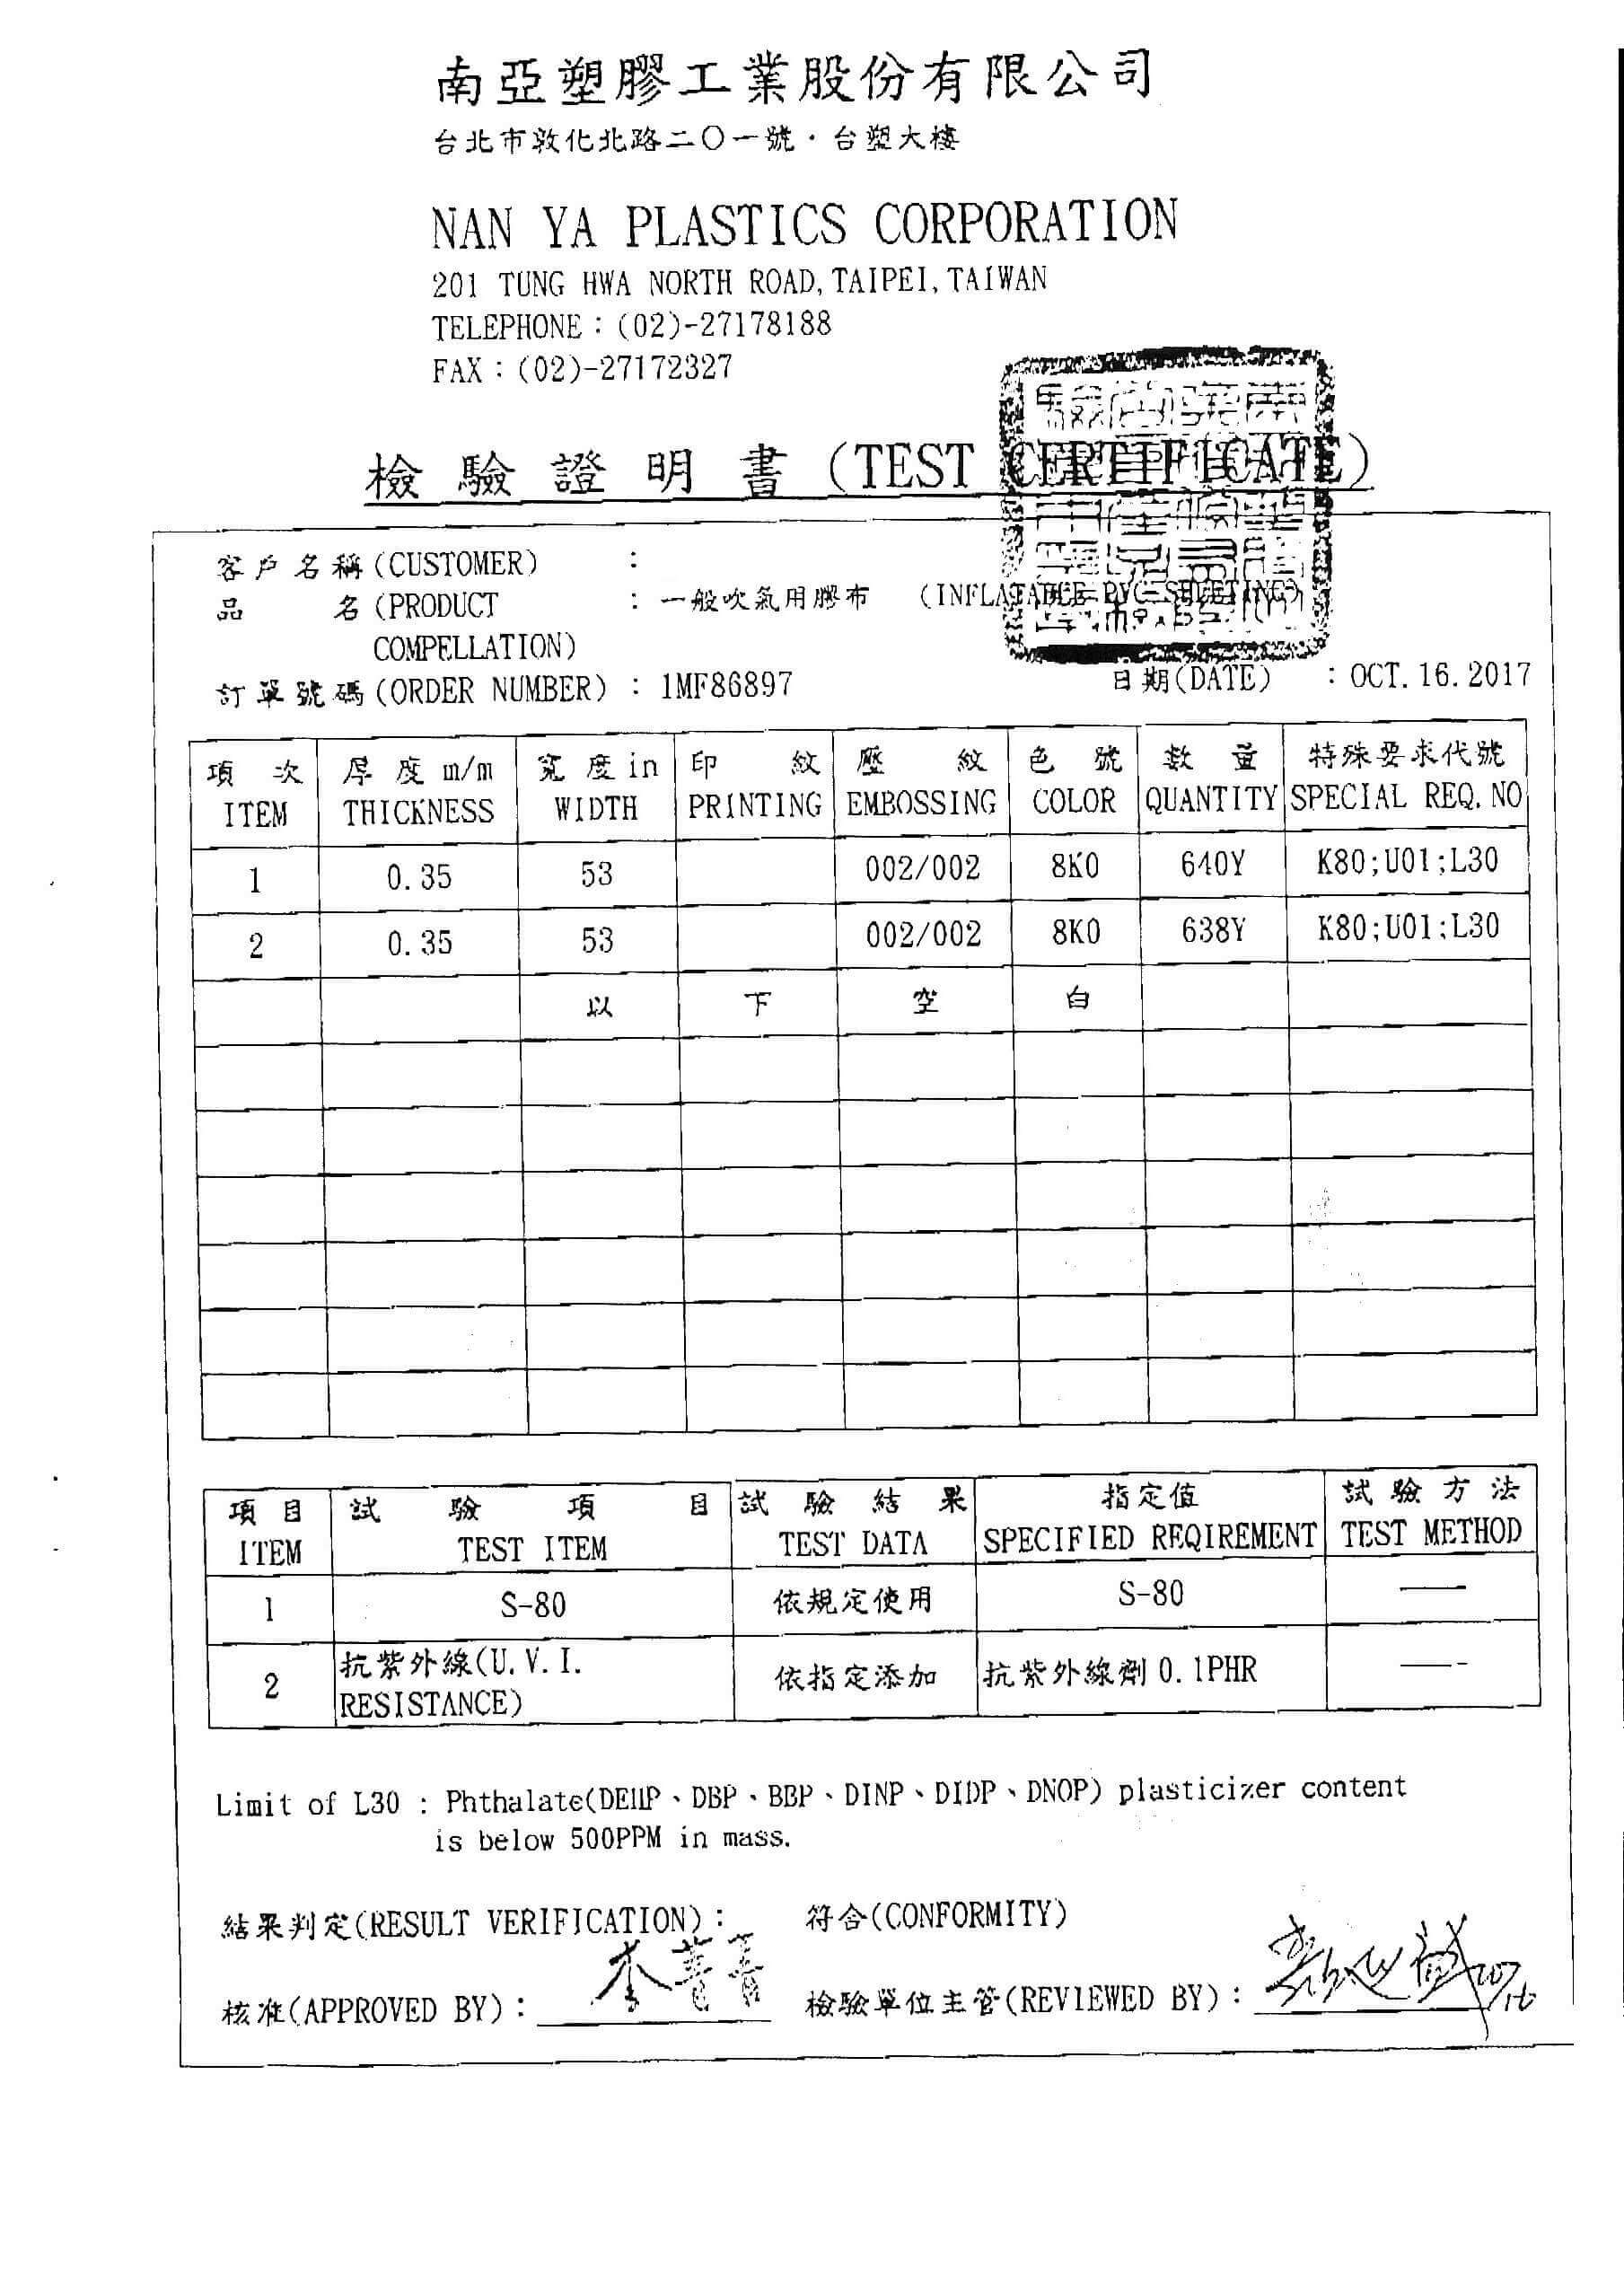 Blue PVC material report page 2 藍色PVC檢驗證明報告第二頁